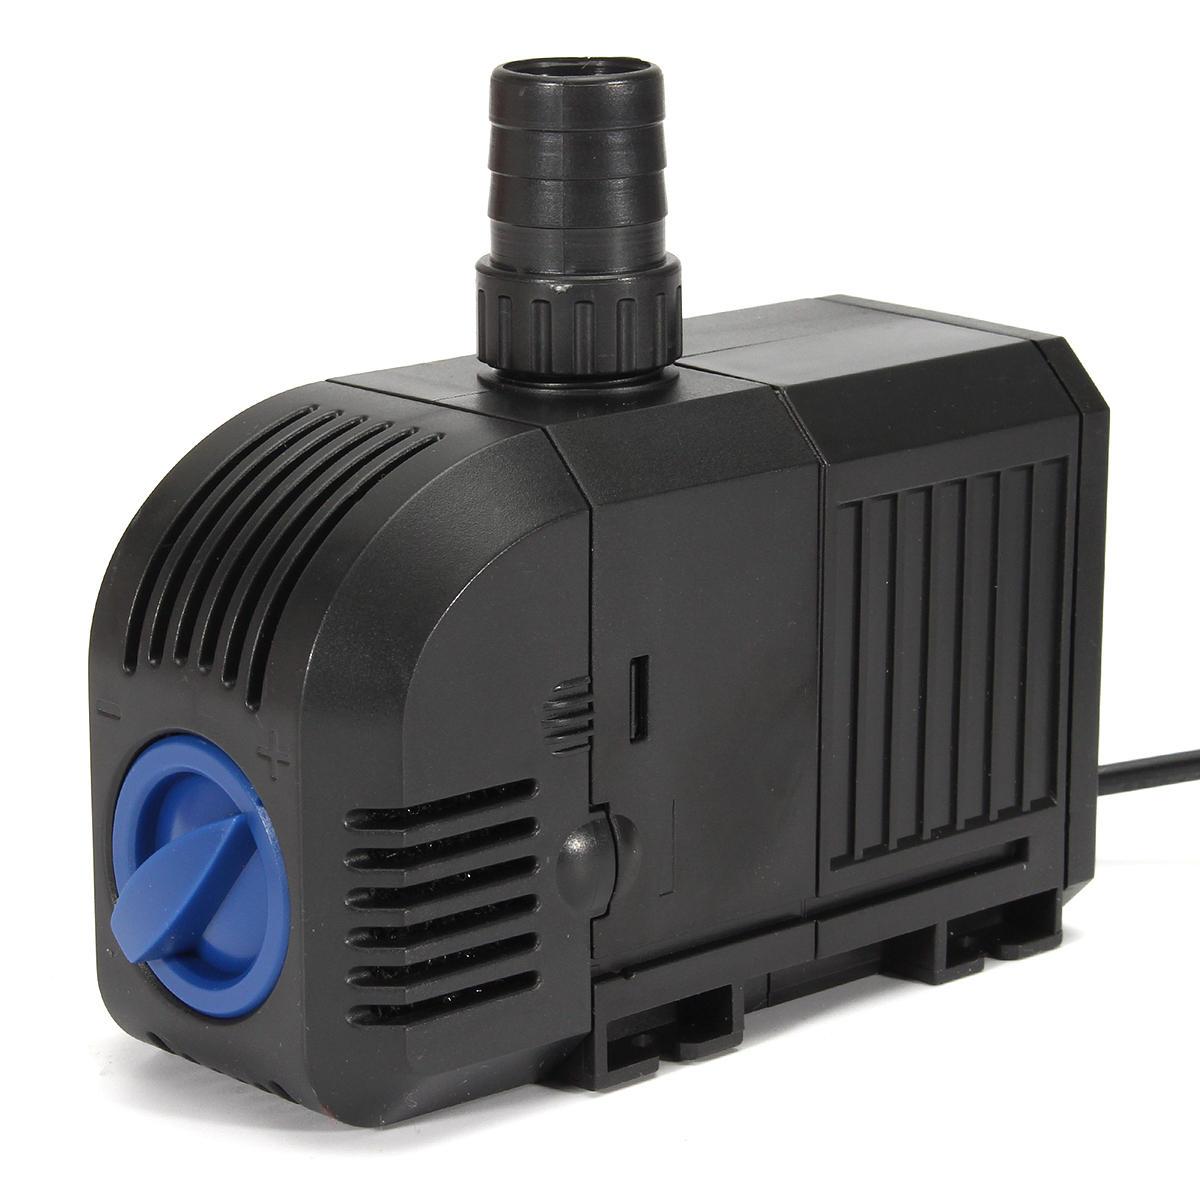 Submersible Pump Aquarium Fish Tank Fountain Water Hydroponic Easy Useful In Short Supply Fish & Aquariums Pumps (water)